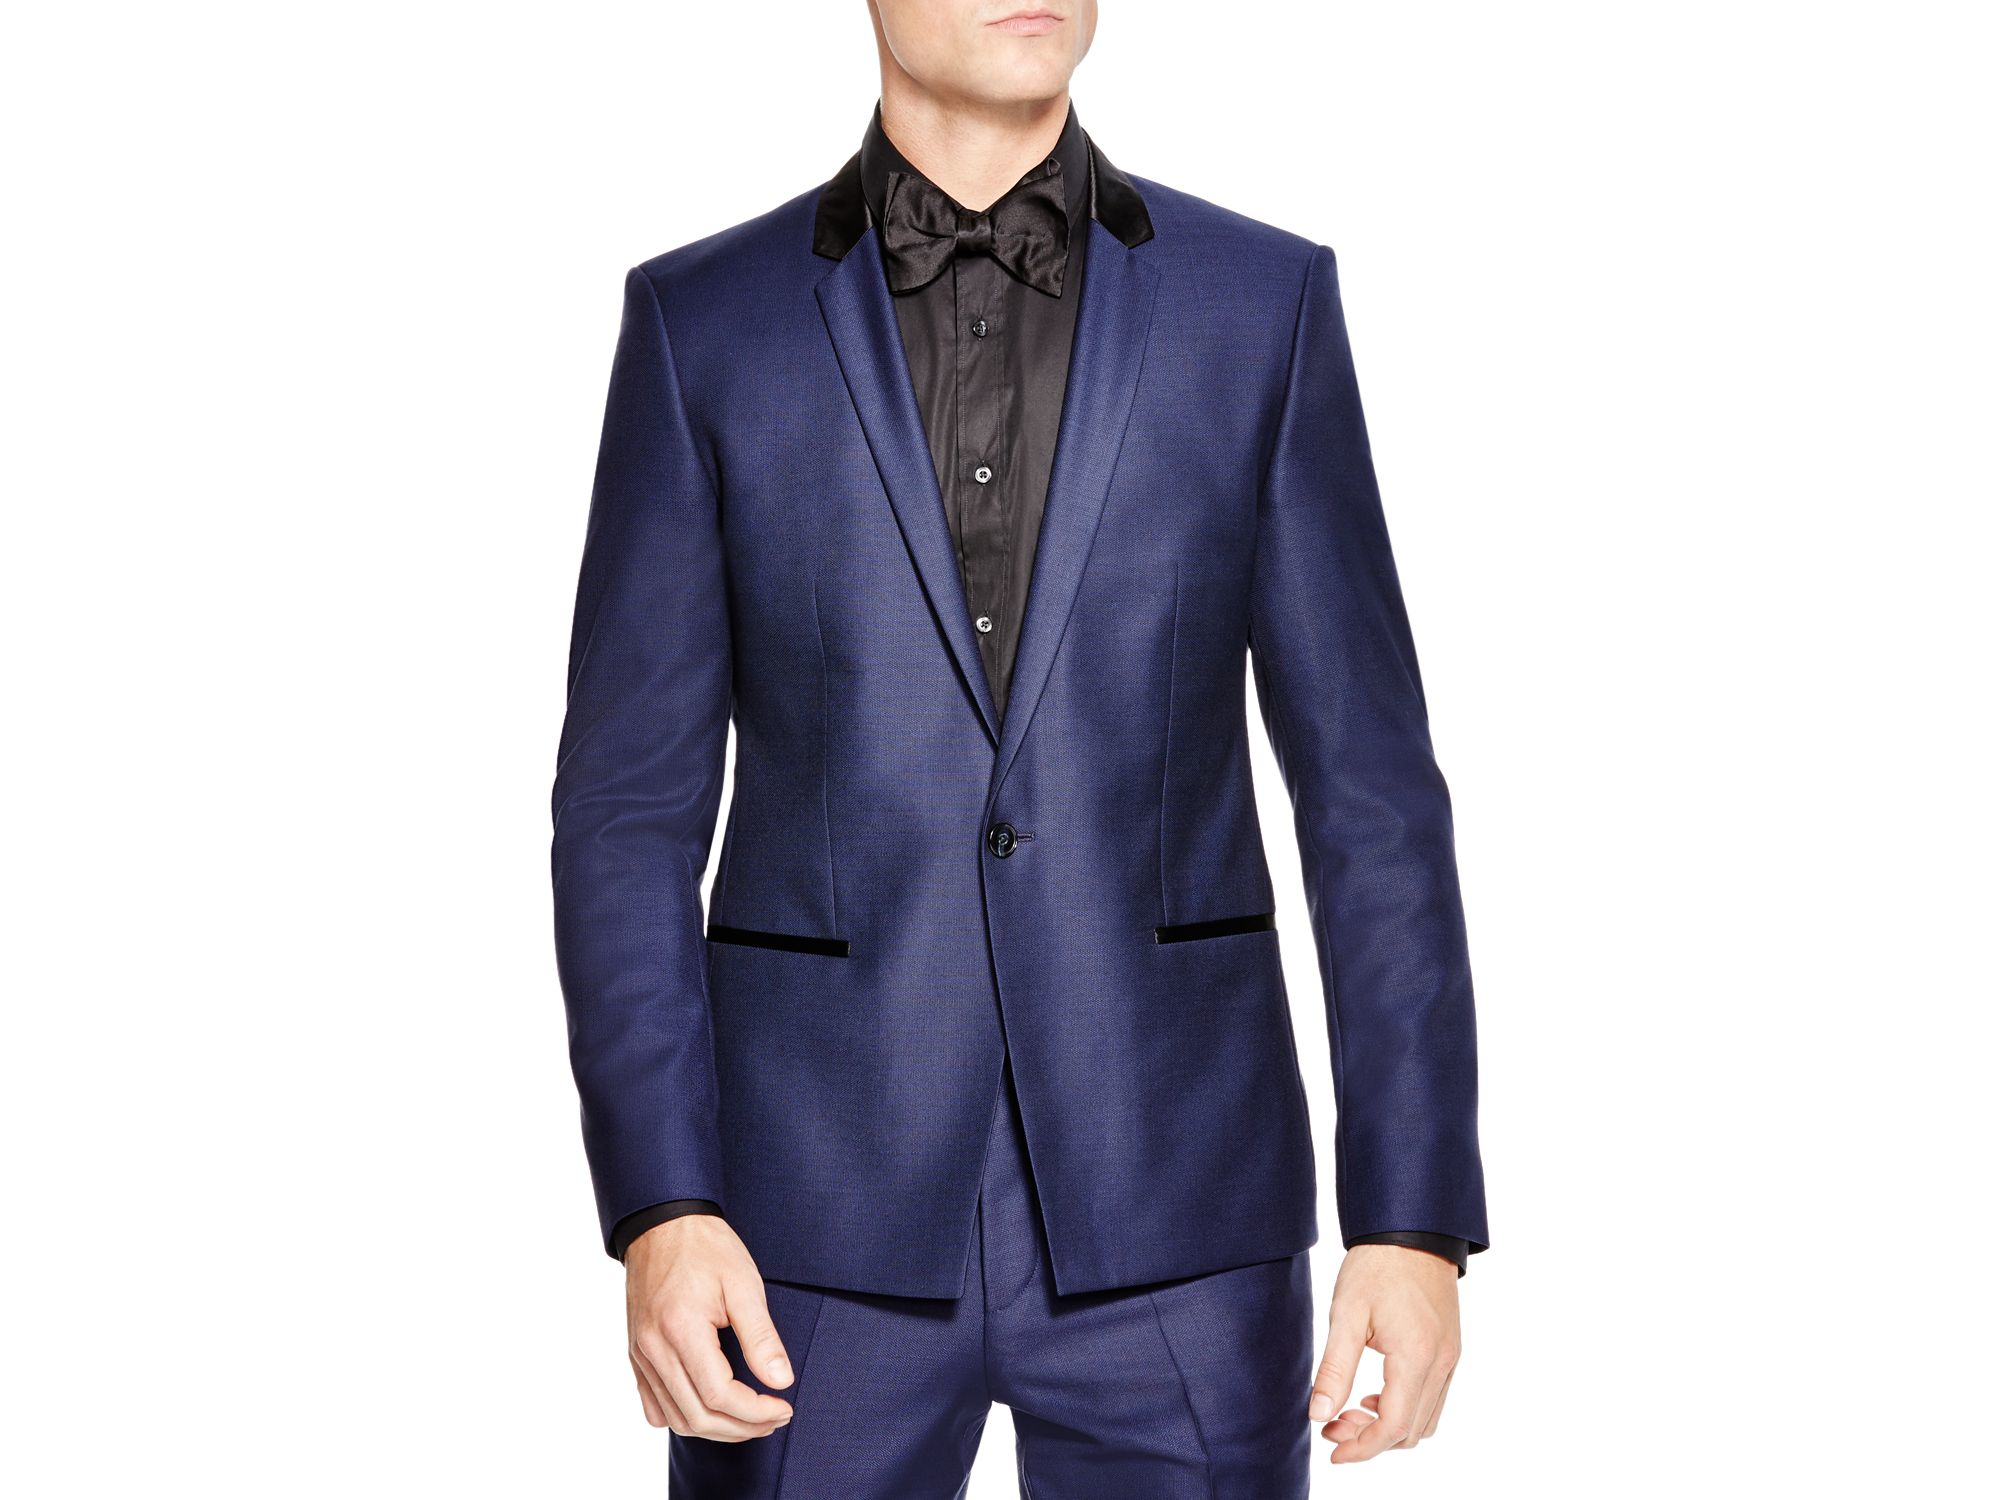 lyst boss hugo textured slim fit tuxedo in blue for men. Black Bedroom Furniture Sets. Home Design Ideas